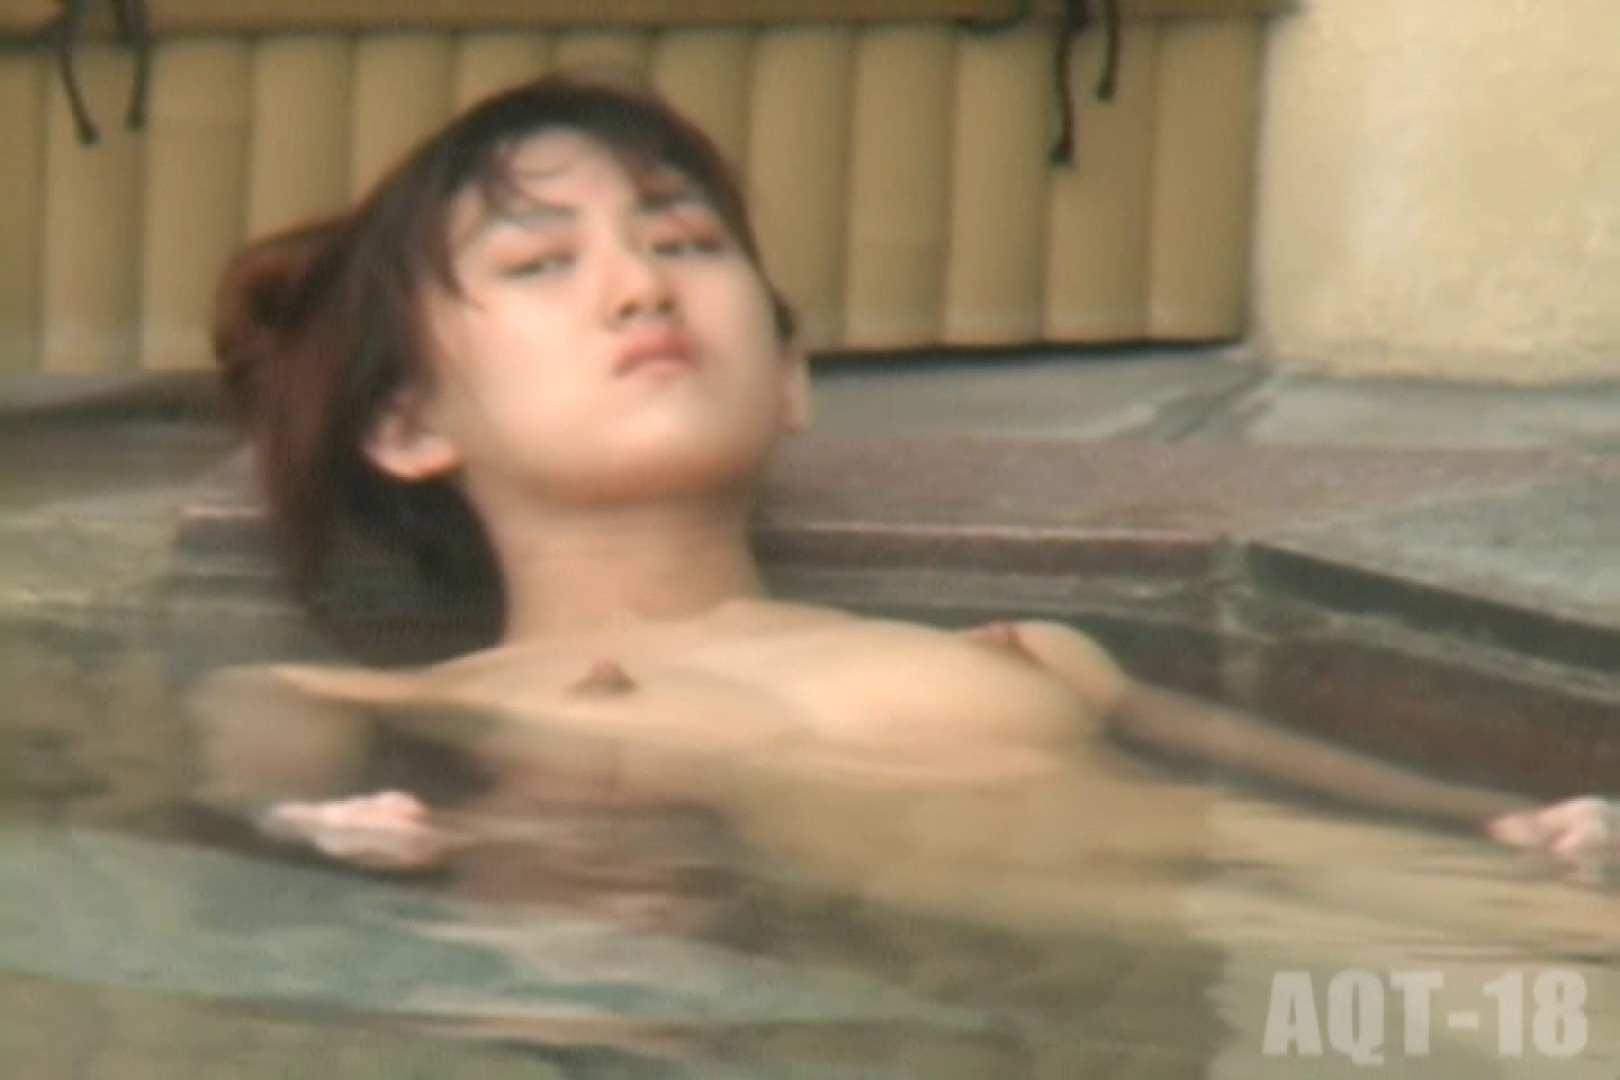 Aquaな露天風呂Vol.862 美しいOLの裸体 戯れ無修正画像 99pic 38